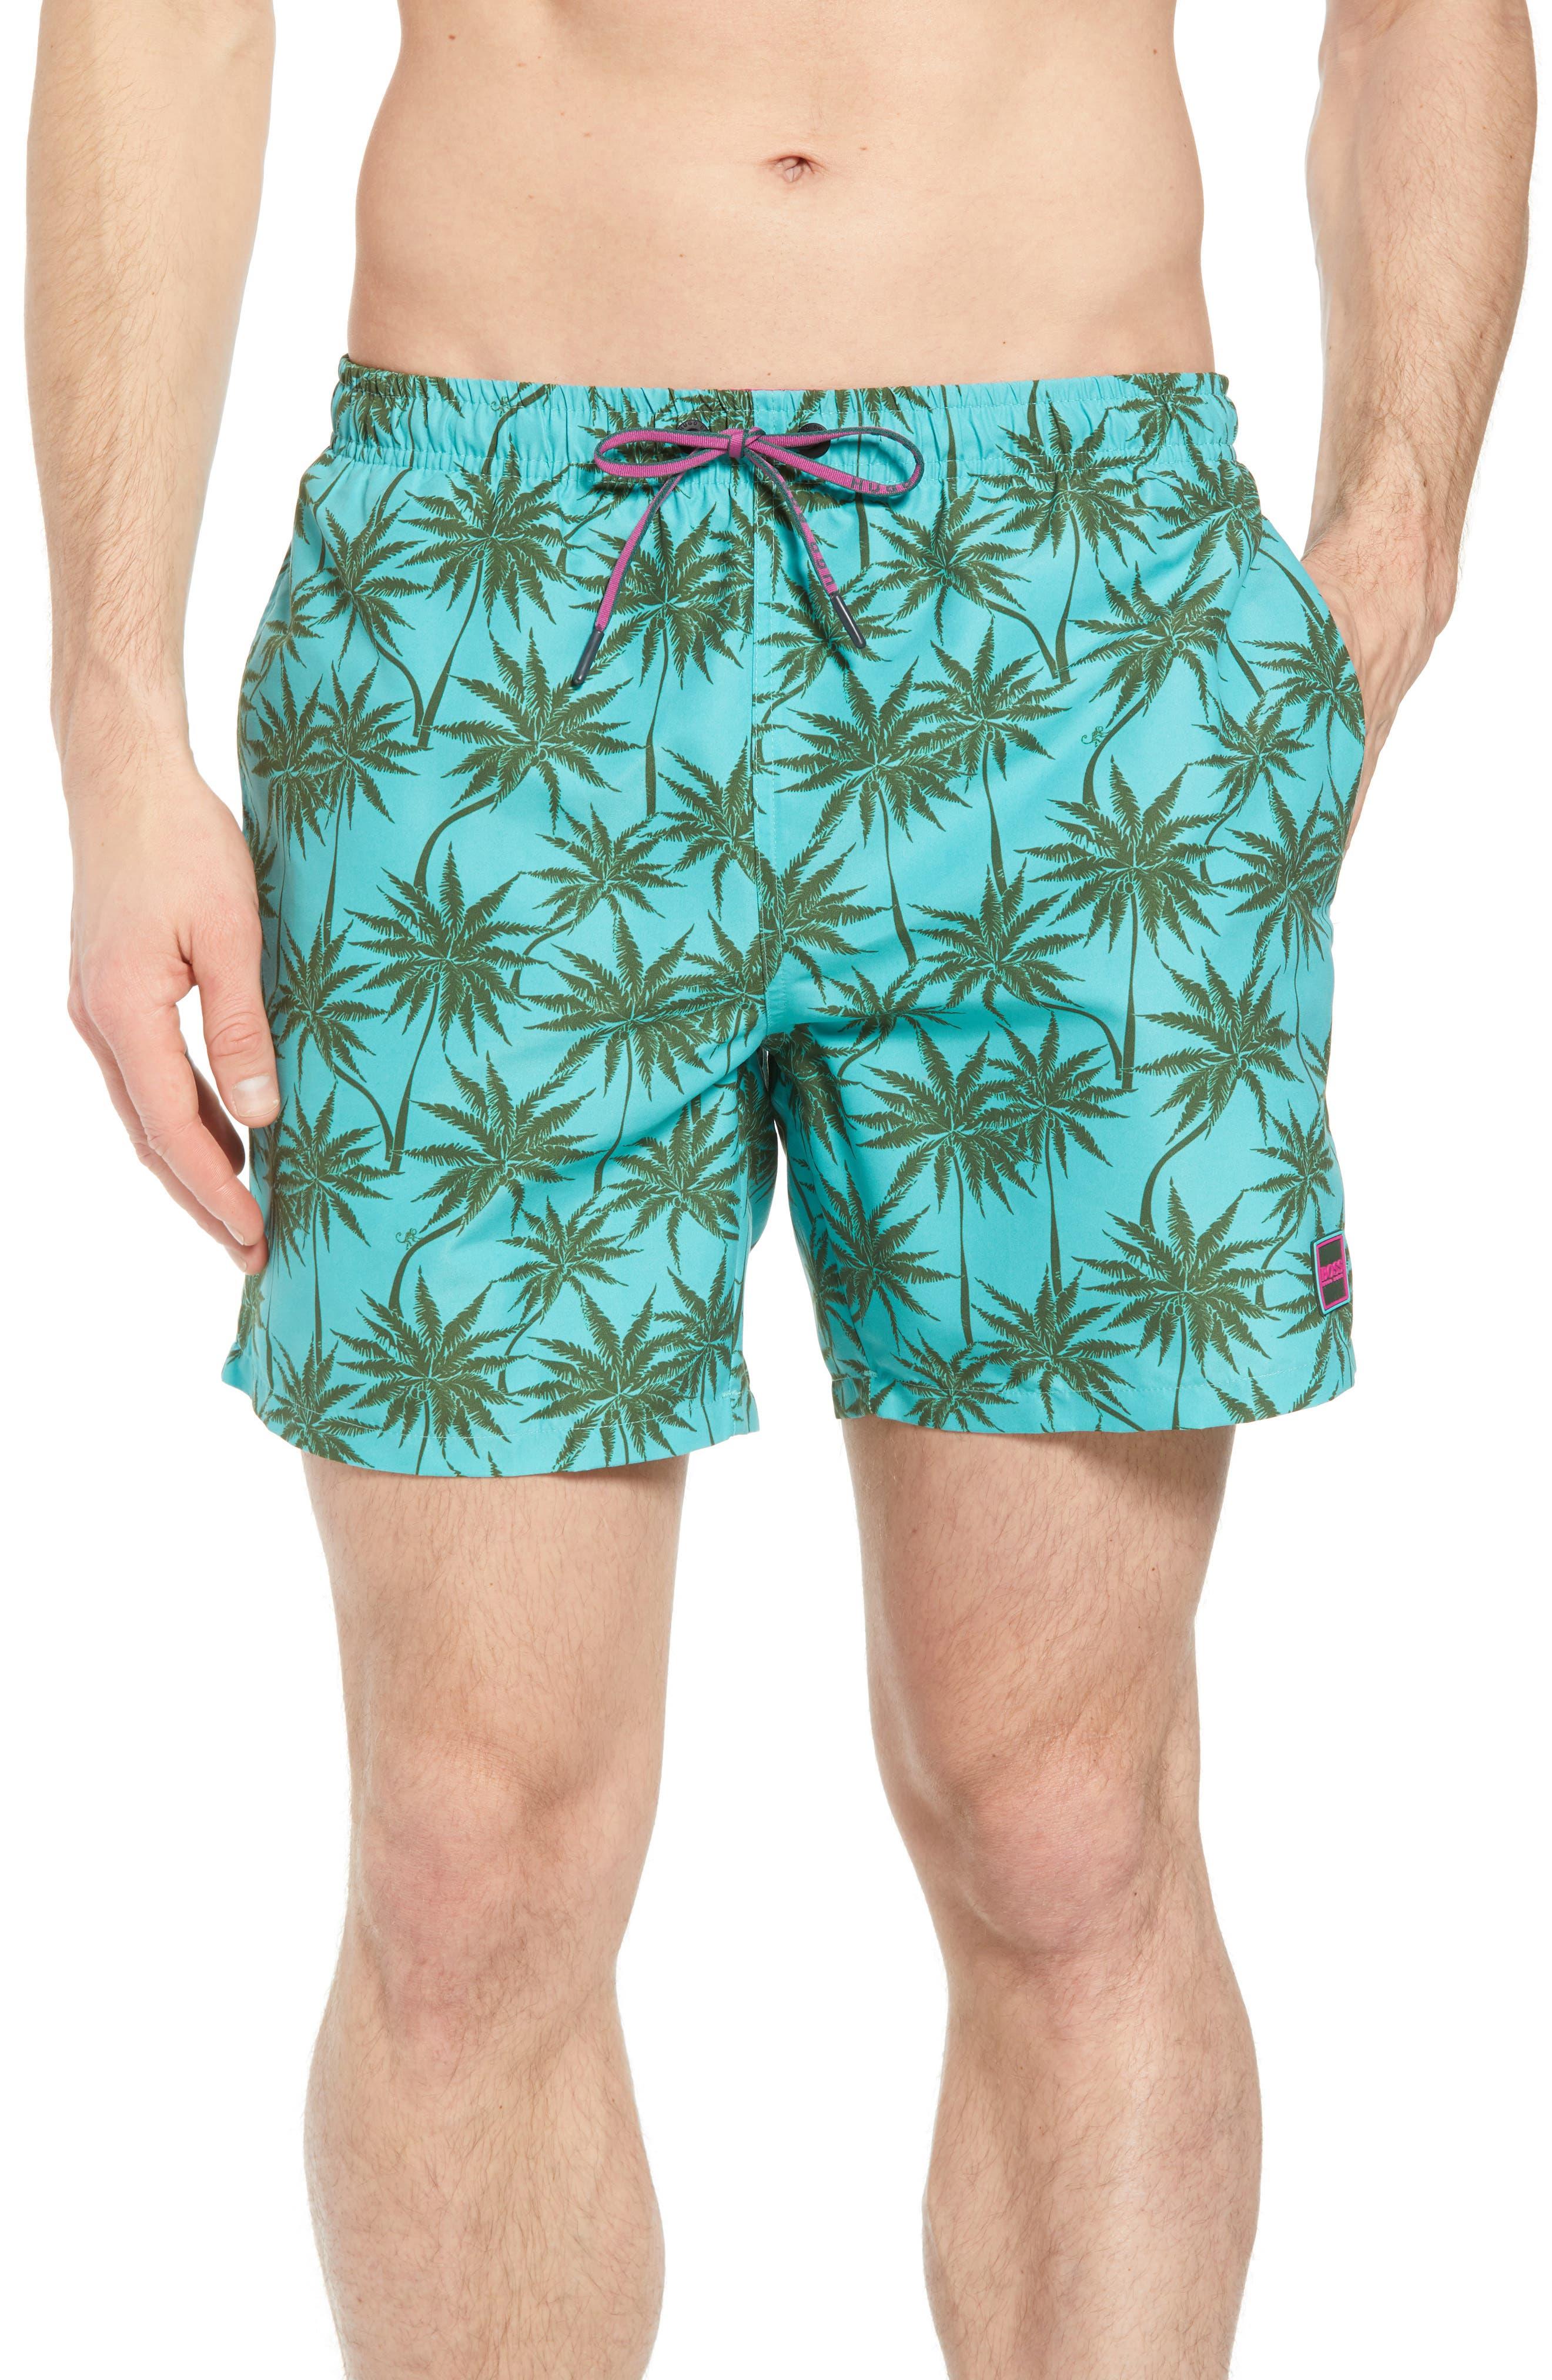 Piranha Palm Tree Swim Trunks,                         Main,                         color, 483